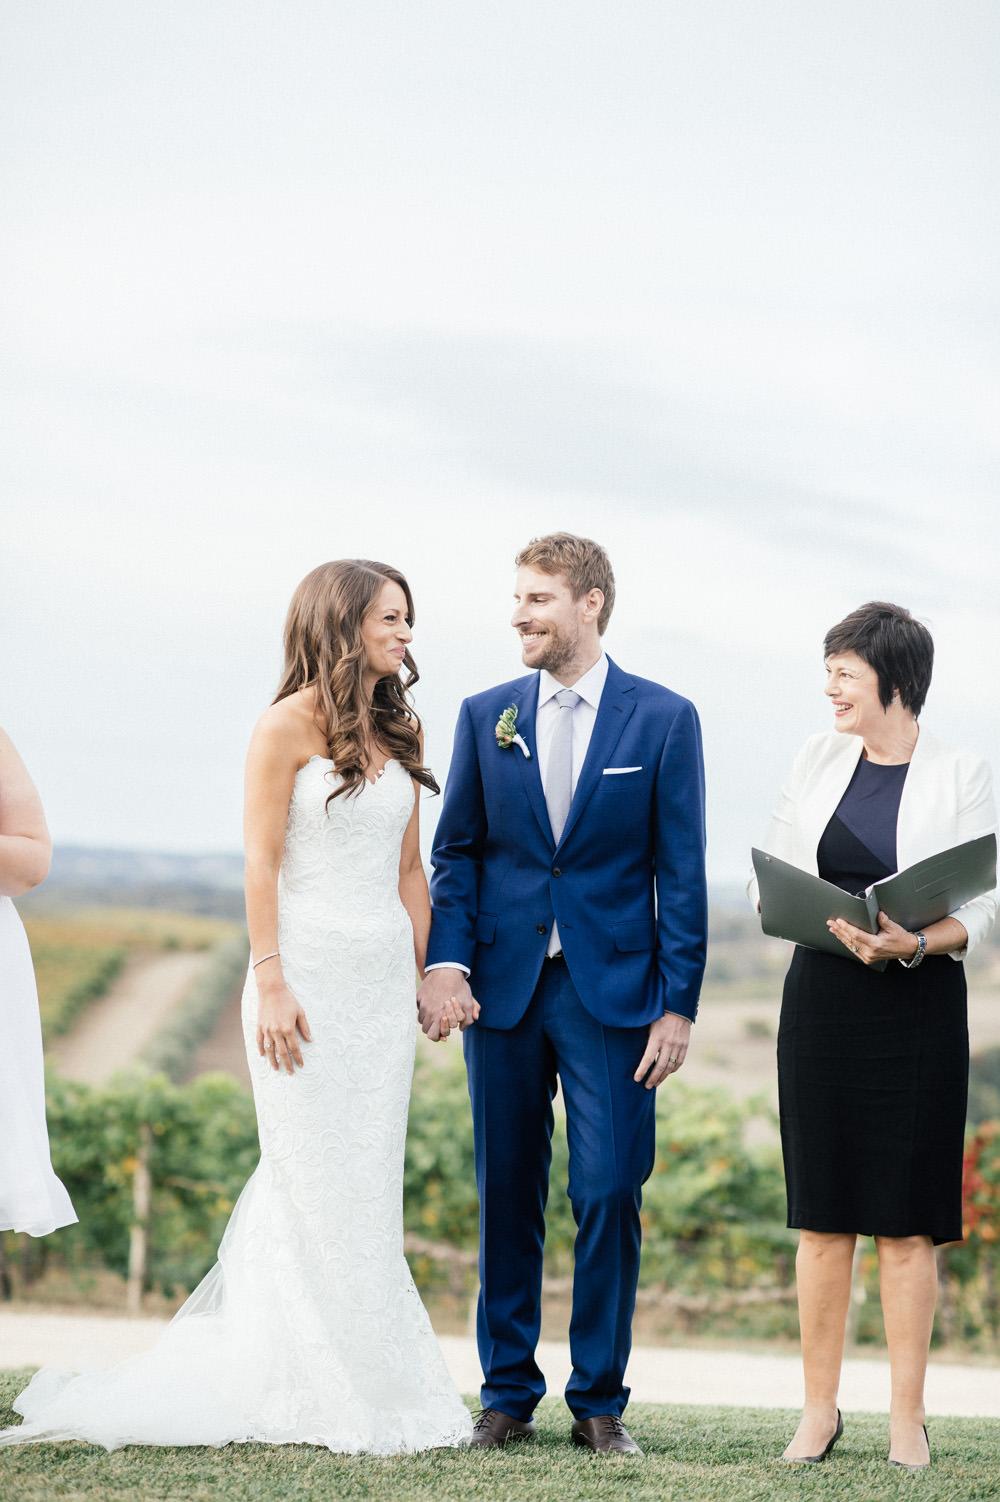 adelaide-hills-wedding-photographers-145.jpg